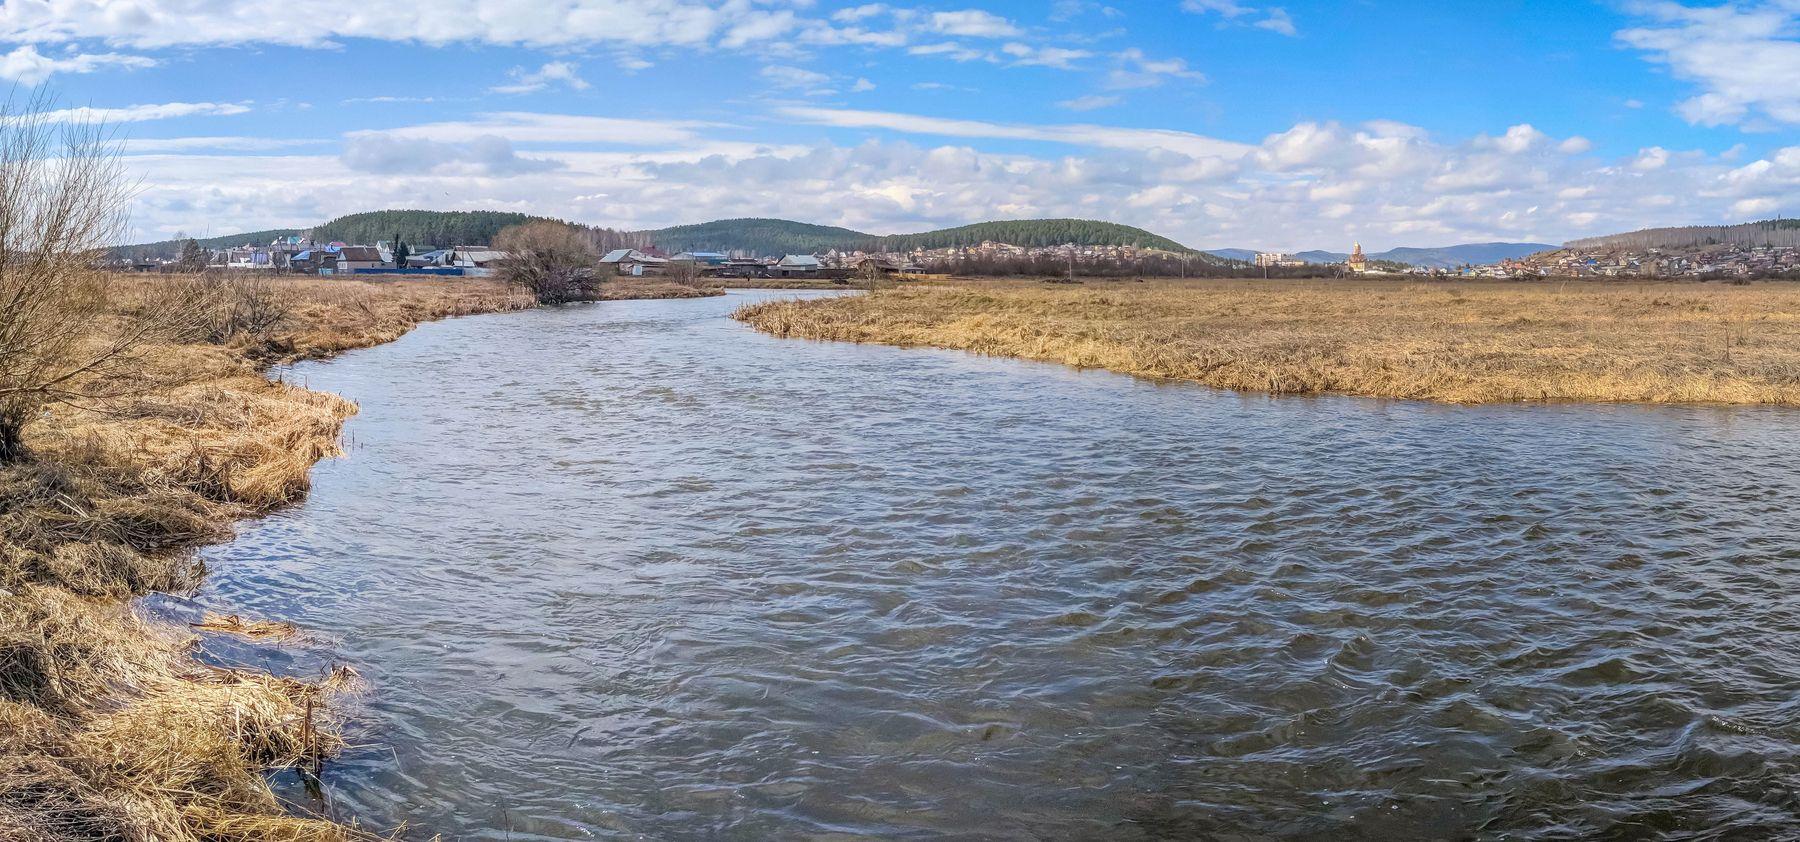 Половодье на реке Миасс. (панорама) Южный Урал Миасс река природа весна